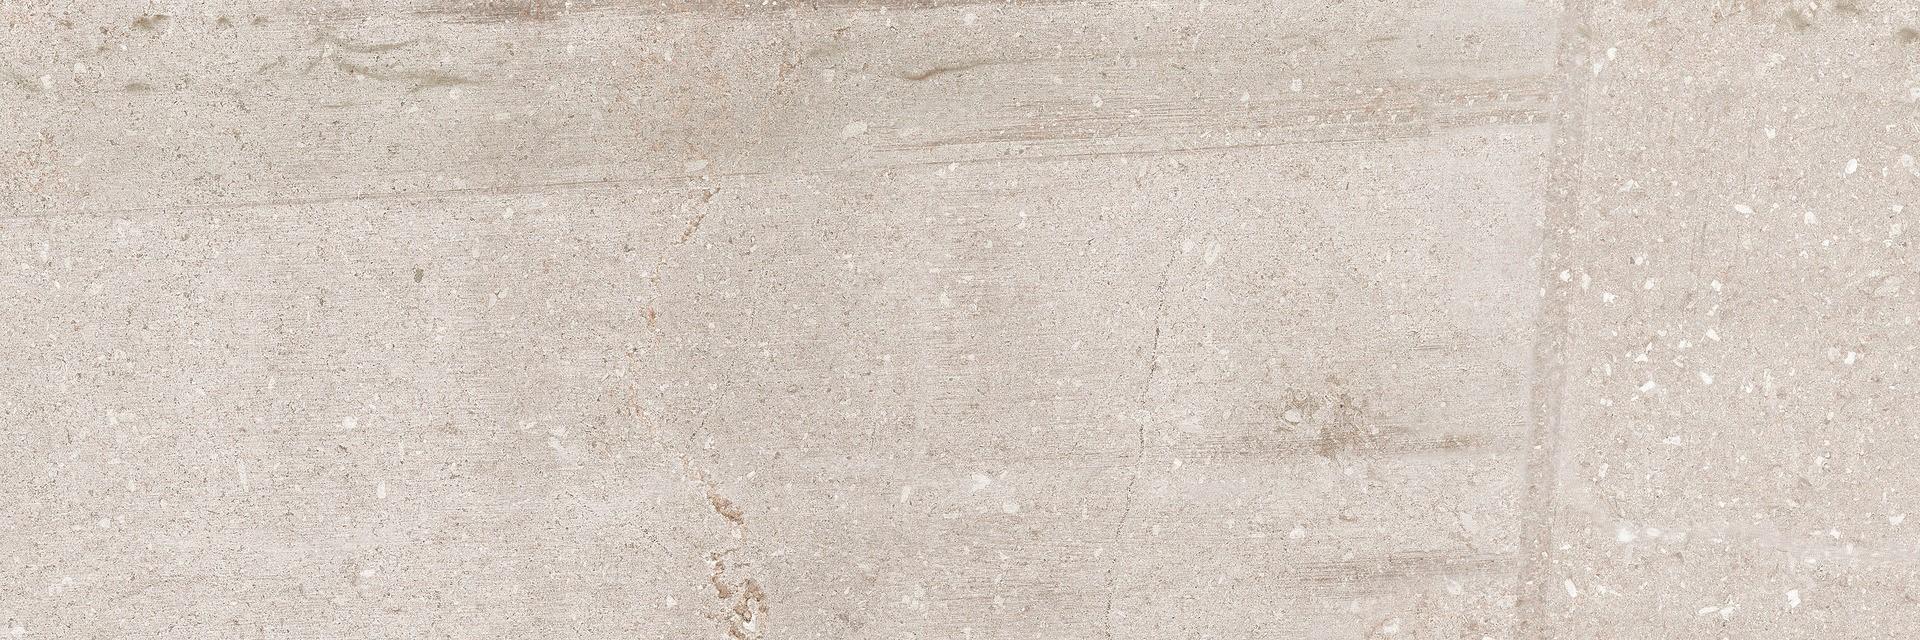 Obklad Grey 30x90 cm, mat